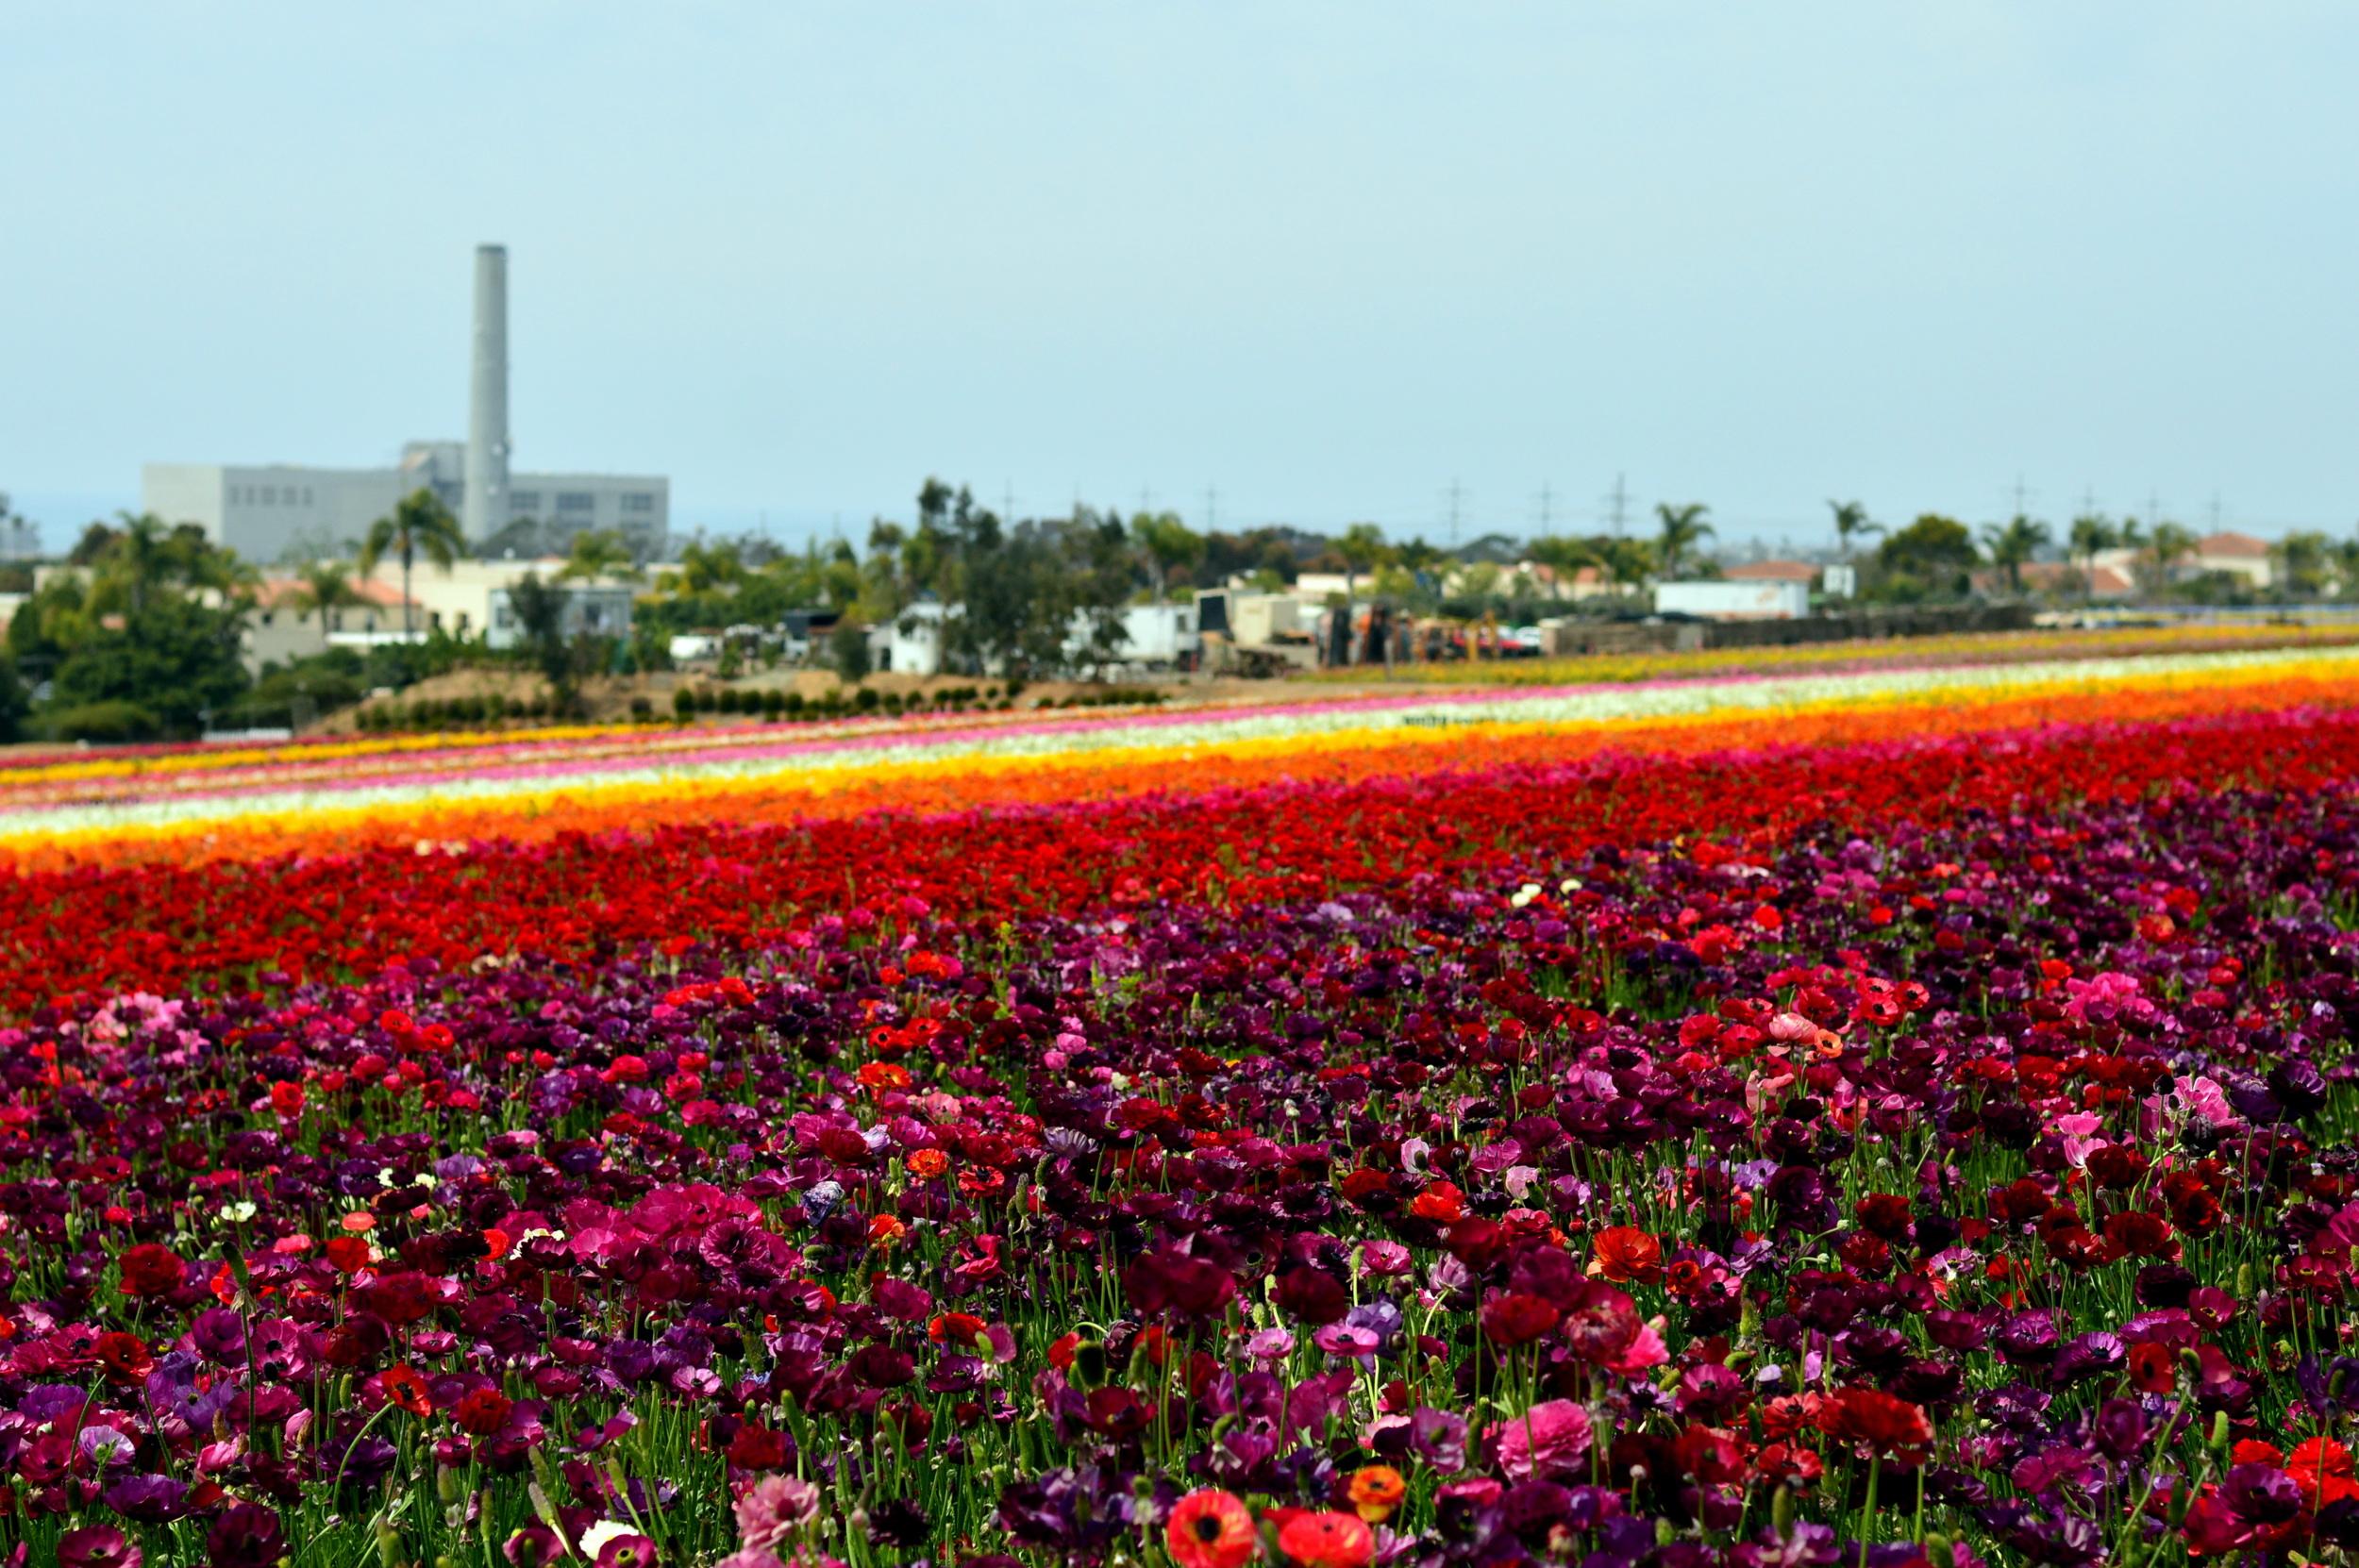 carlsbad-california-travel-flower-fields-blogger